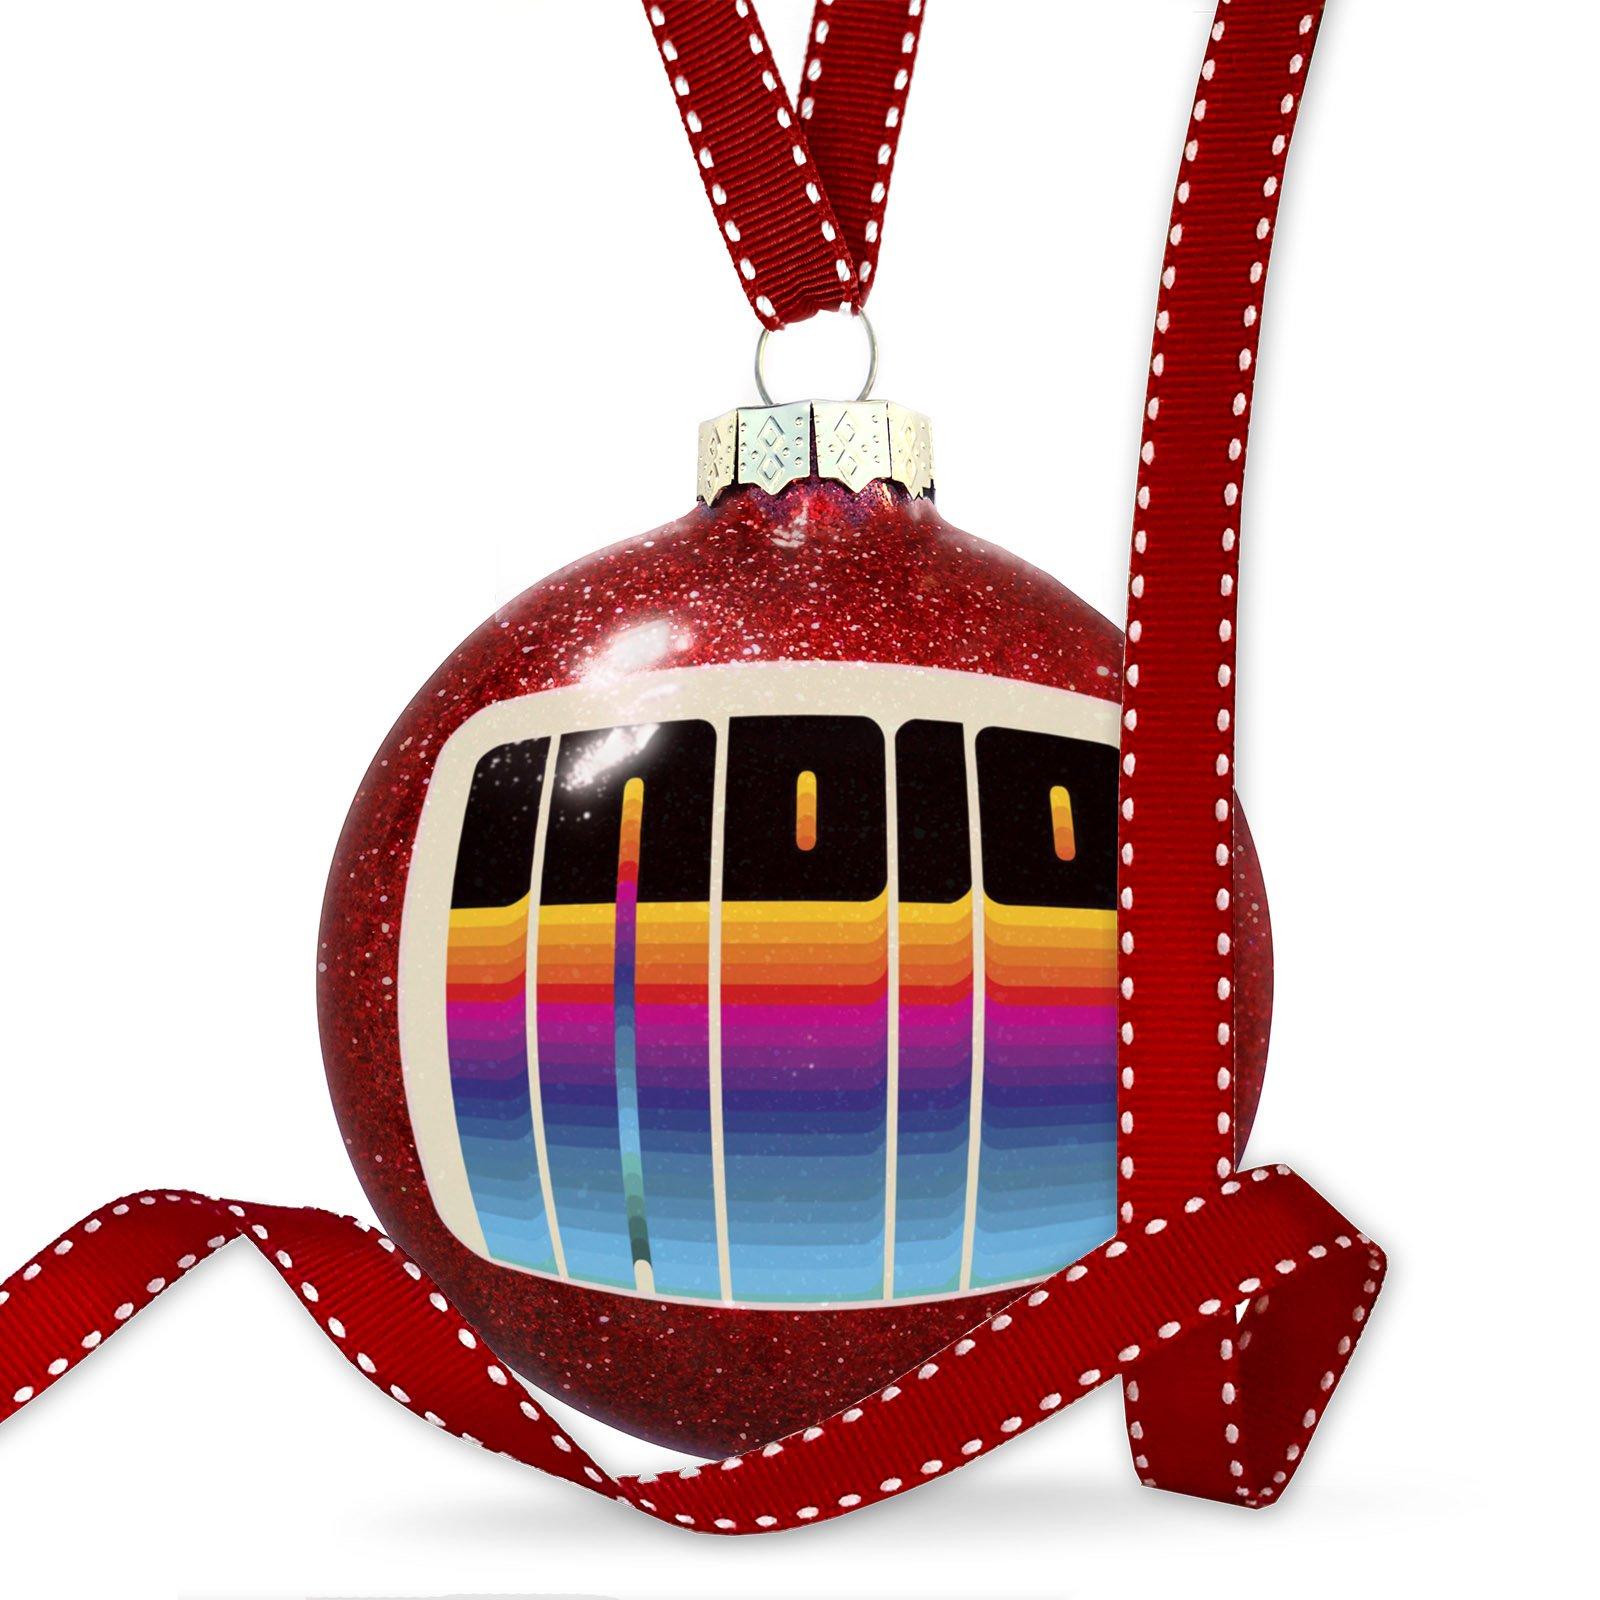 Christmas Decoration Retro Cites States Countries Indio Ornament